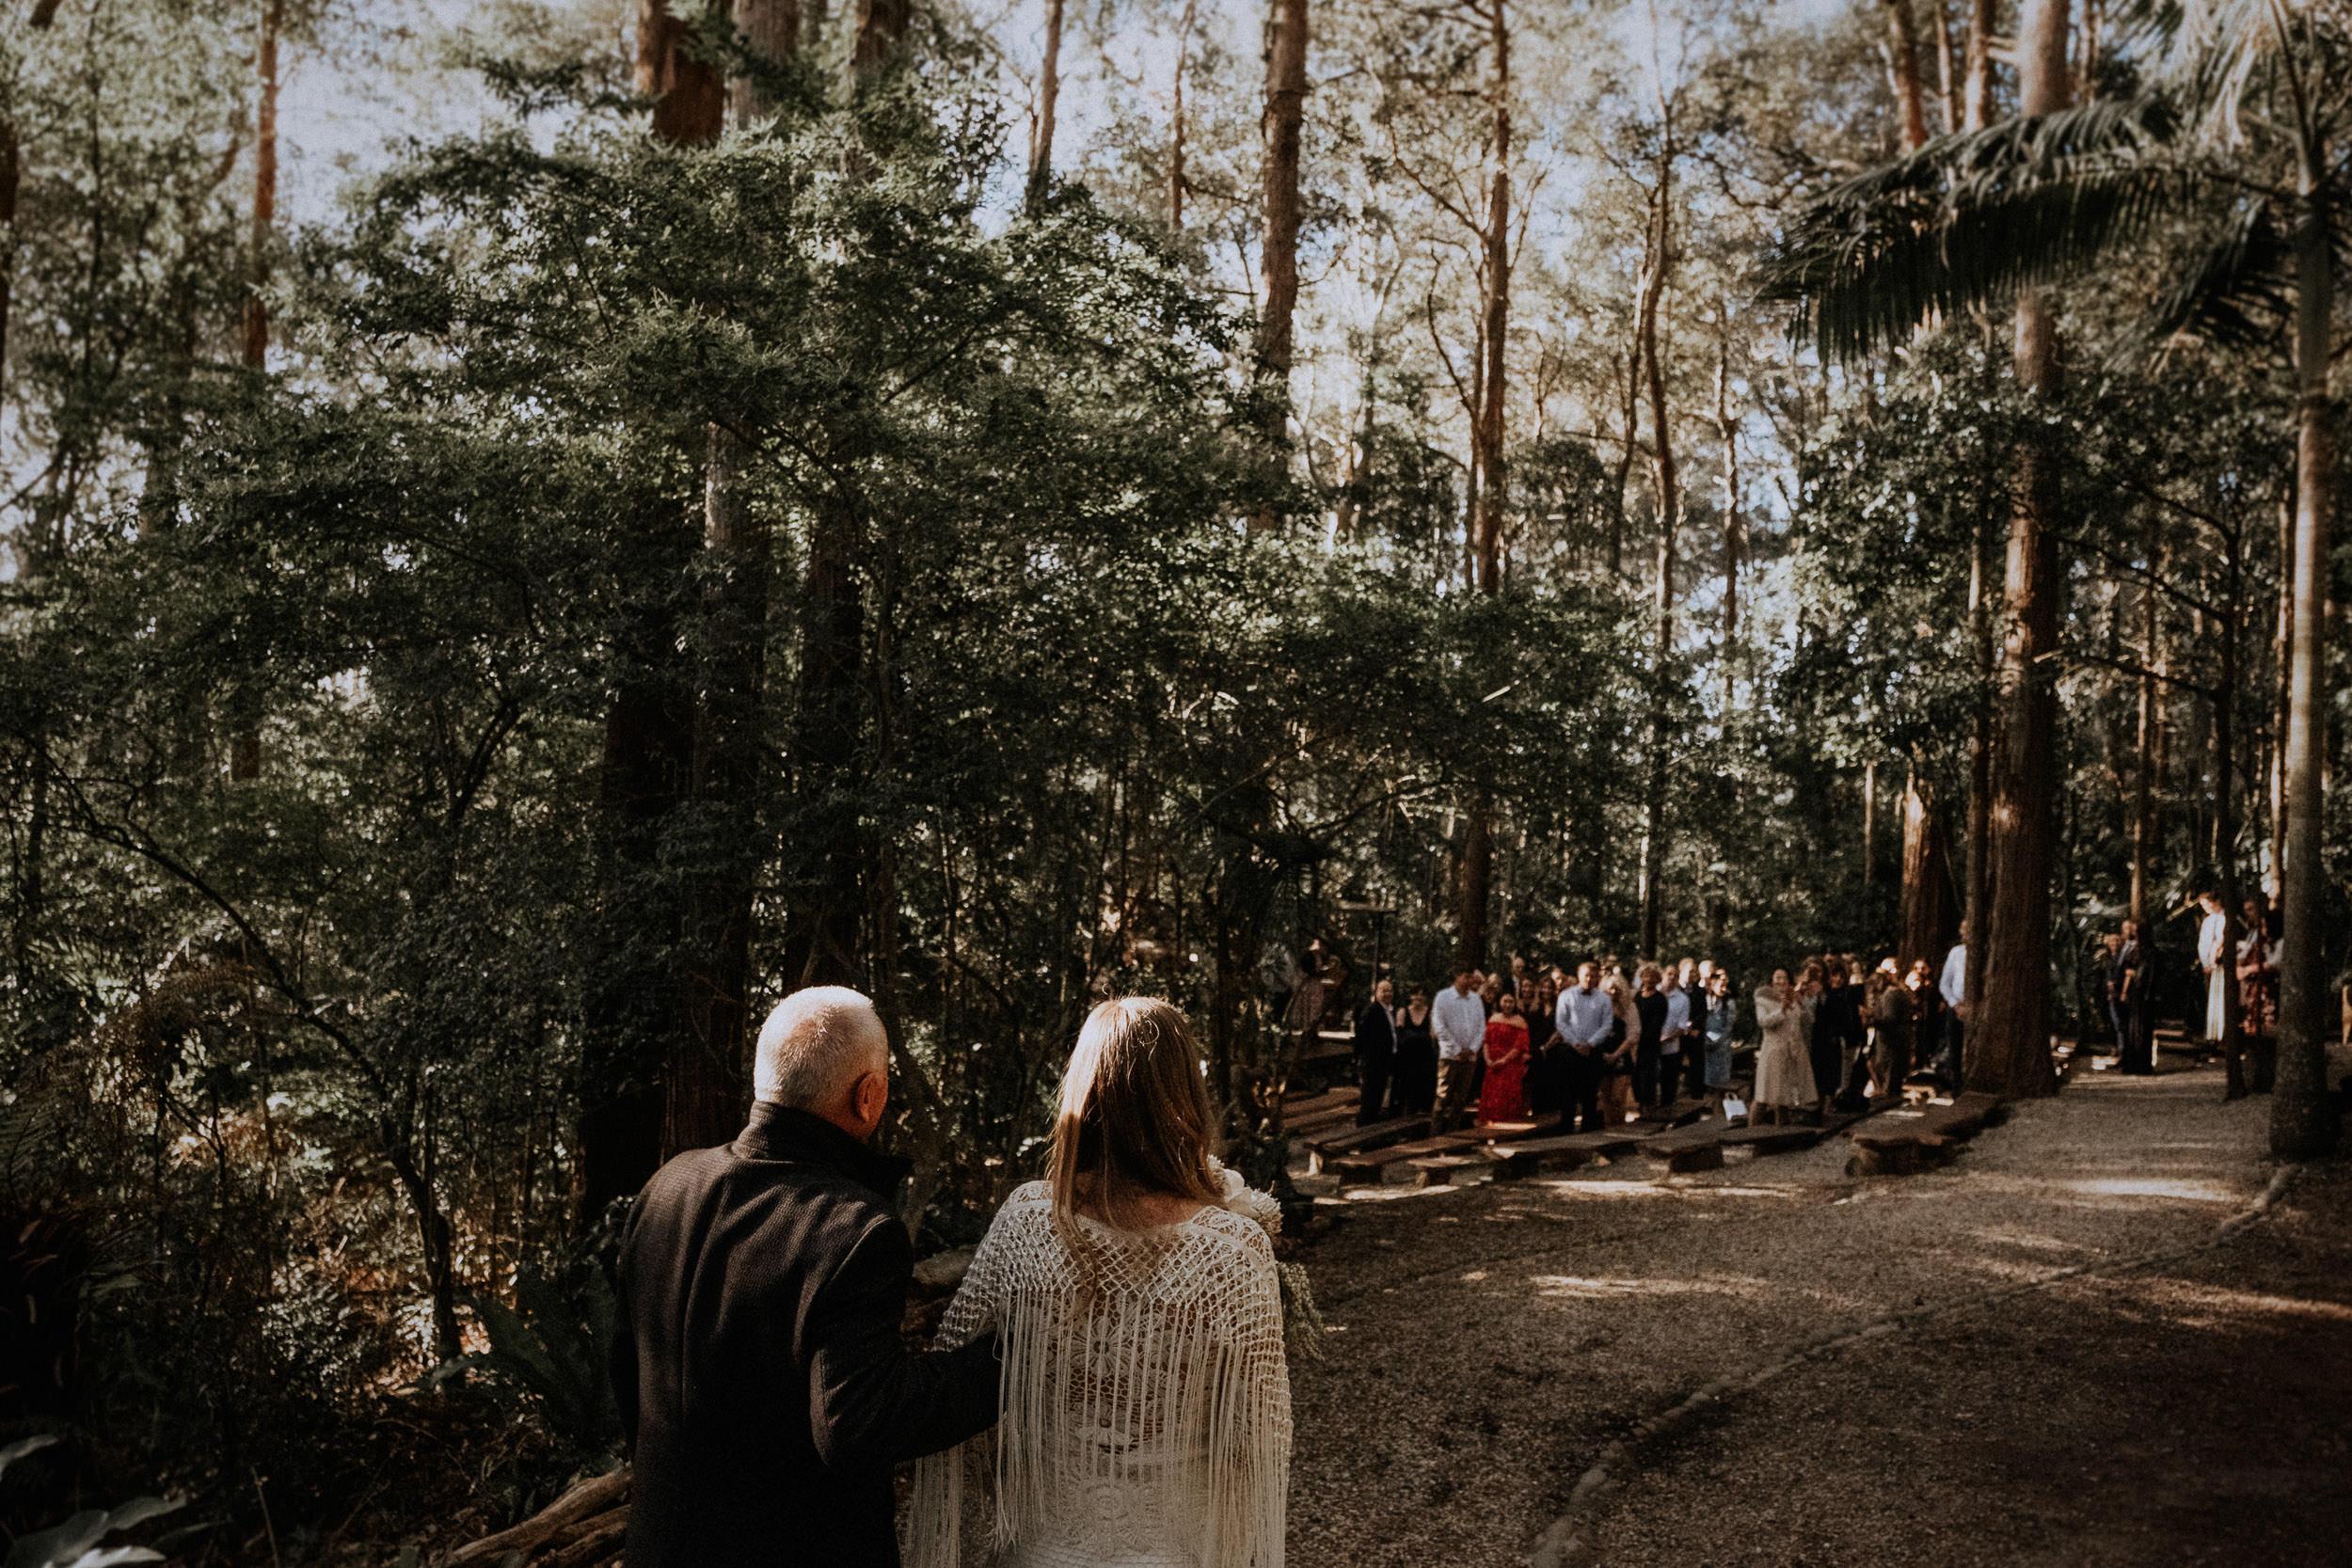 S&A Elopement - Kings & Thieves - Shred 'Til Dead - Central Coast Beach Forest Wedding - 160.jpg